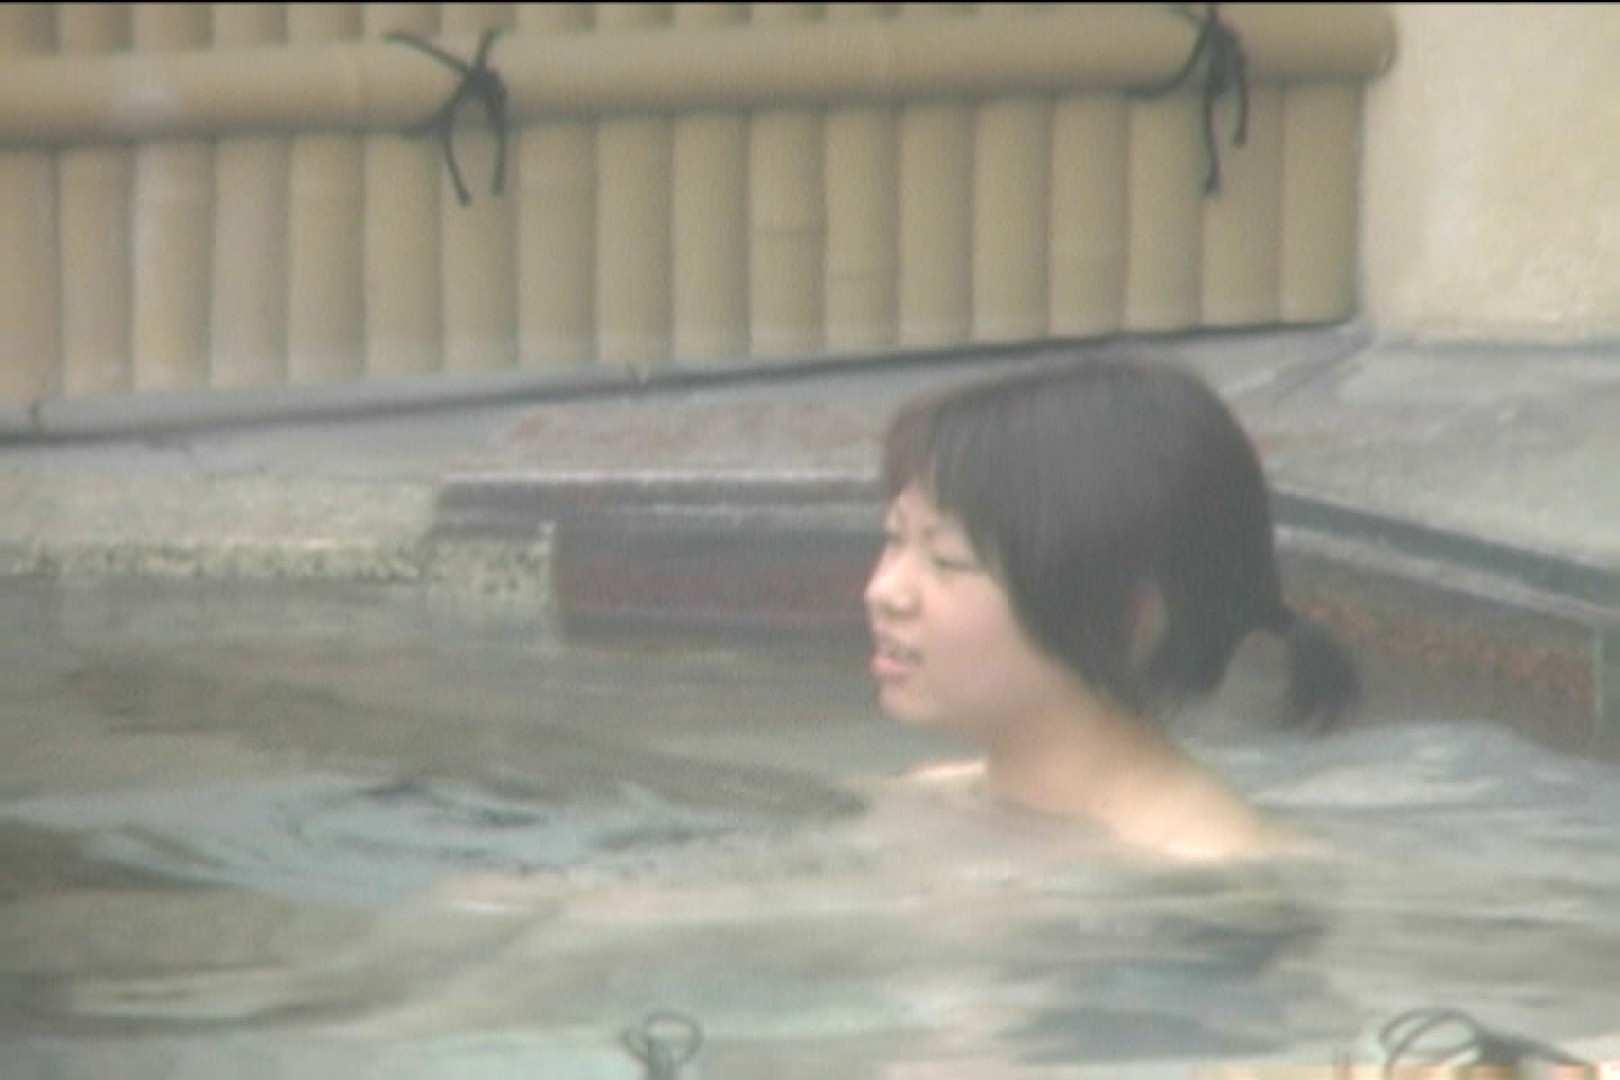 Aquaな露天風呂Vol.141 盗撮シリーズ   露天風呂編  96PIX 45